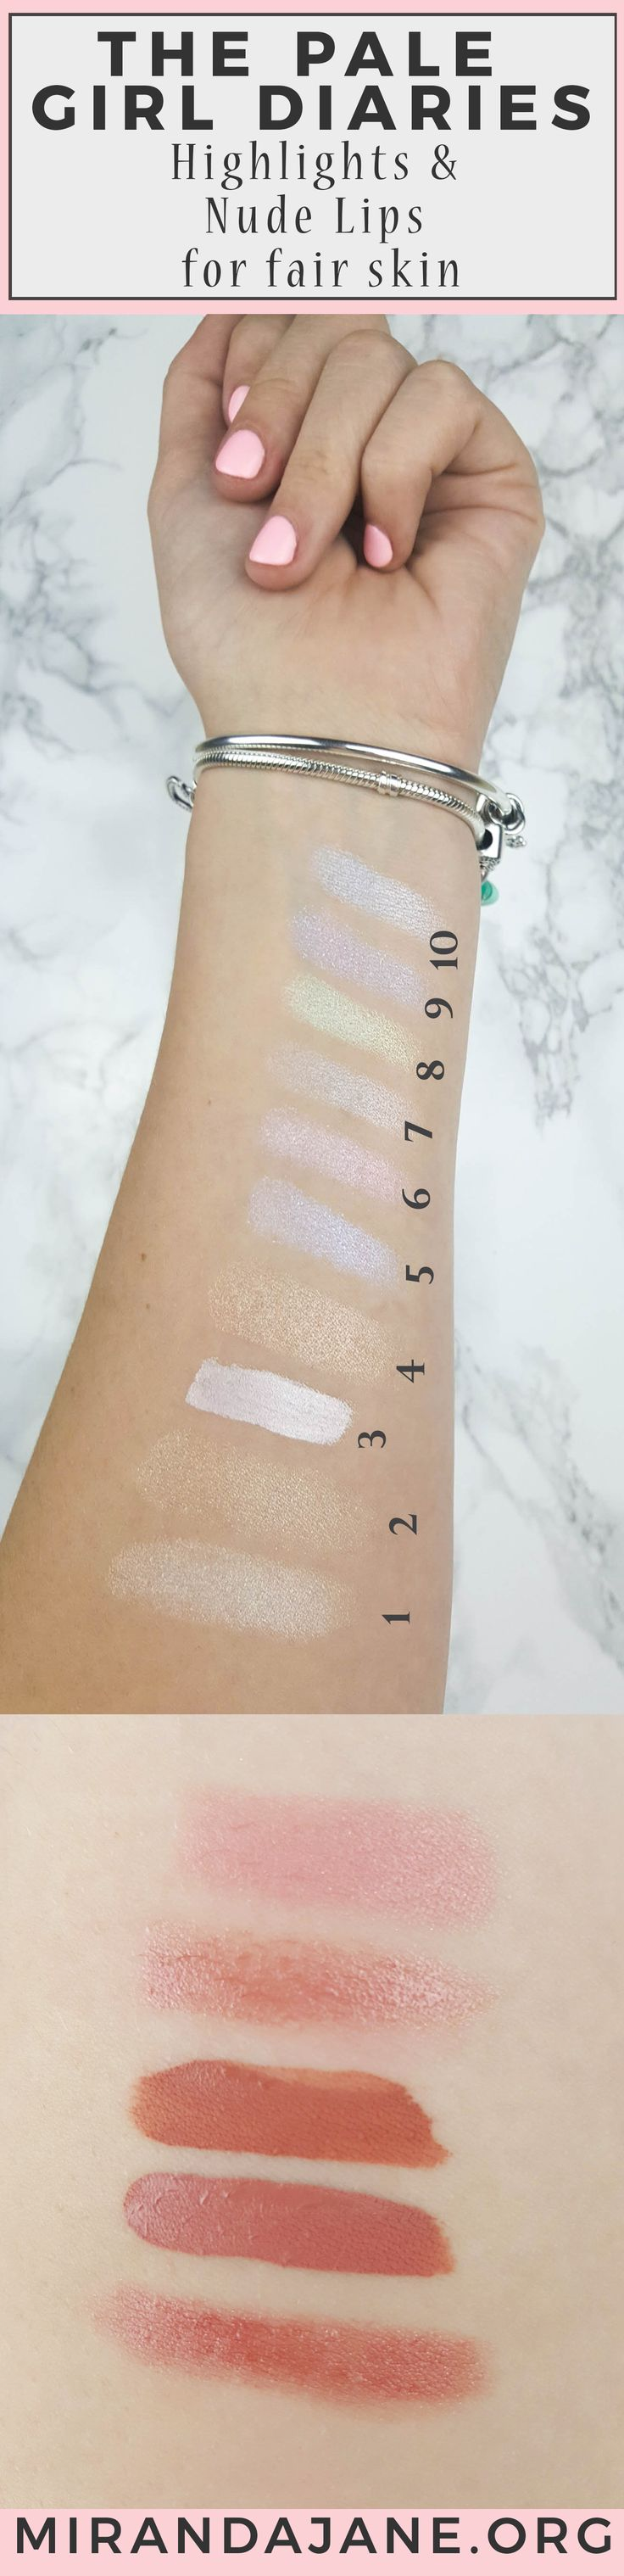 Makeup Tips for Pale Girls | Best Highlighters for Fair Skin | Nude Lipsticks for Pale Skin | Makeup Tricks for Fair Skin